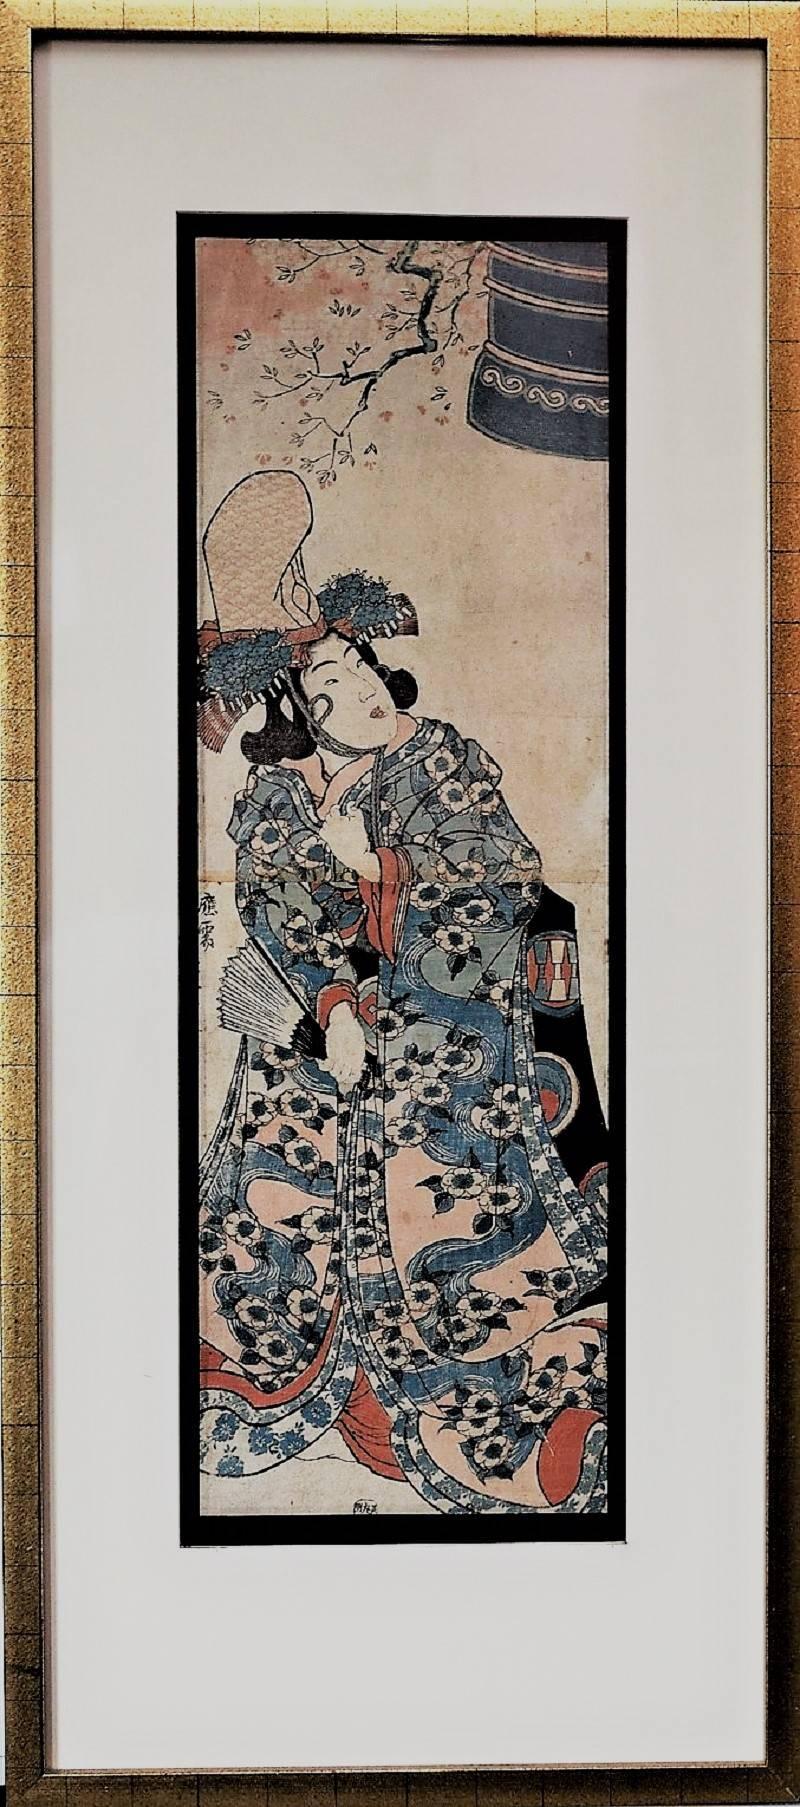 Shirabioshi (Temple Dancer